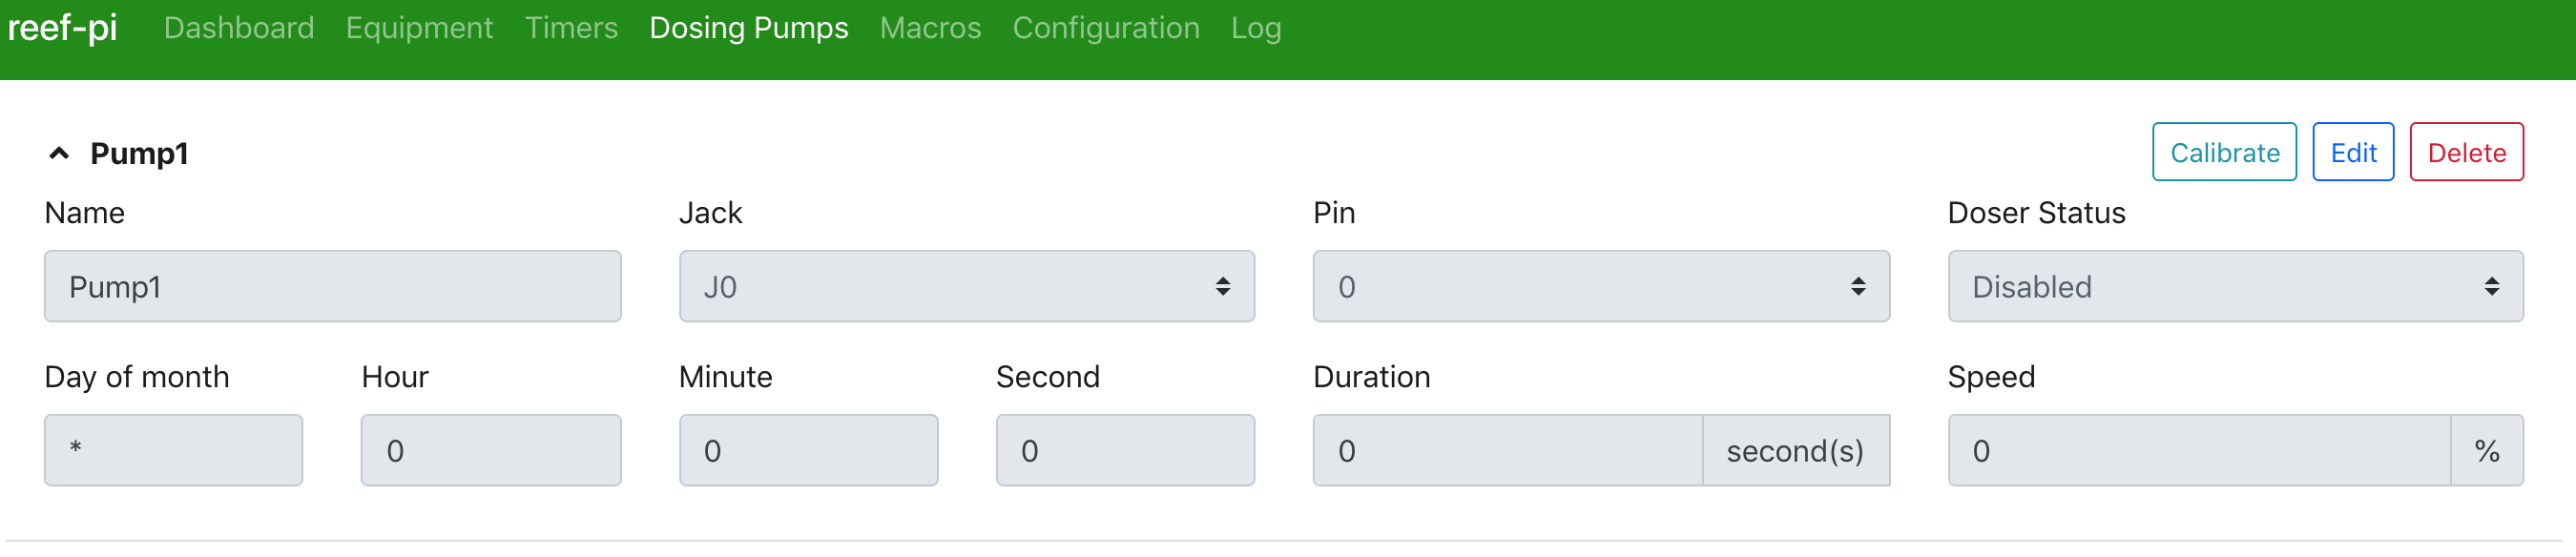 components_Screen_Shot_2018-11-18_at_2.40.41_AM.png